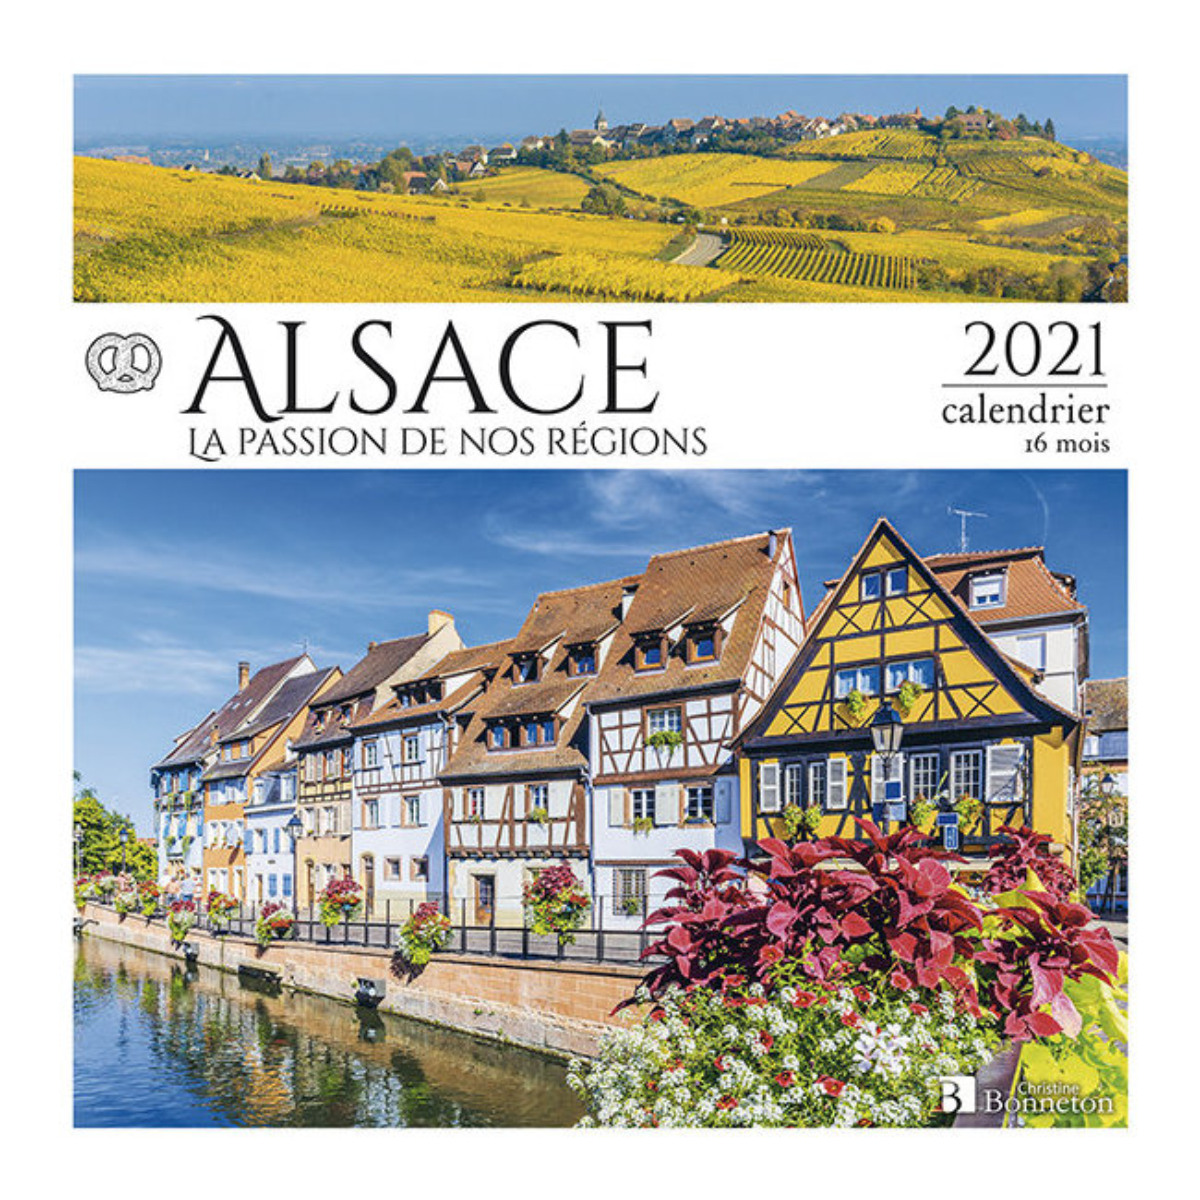 Calendrier 2021 Alsace Calendrier 2021 Alsace